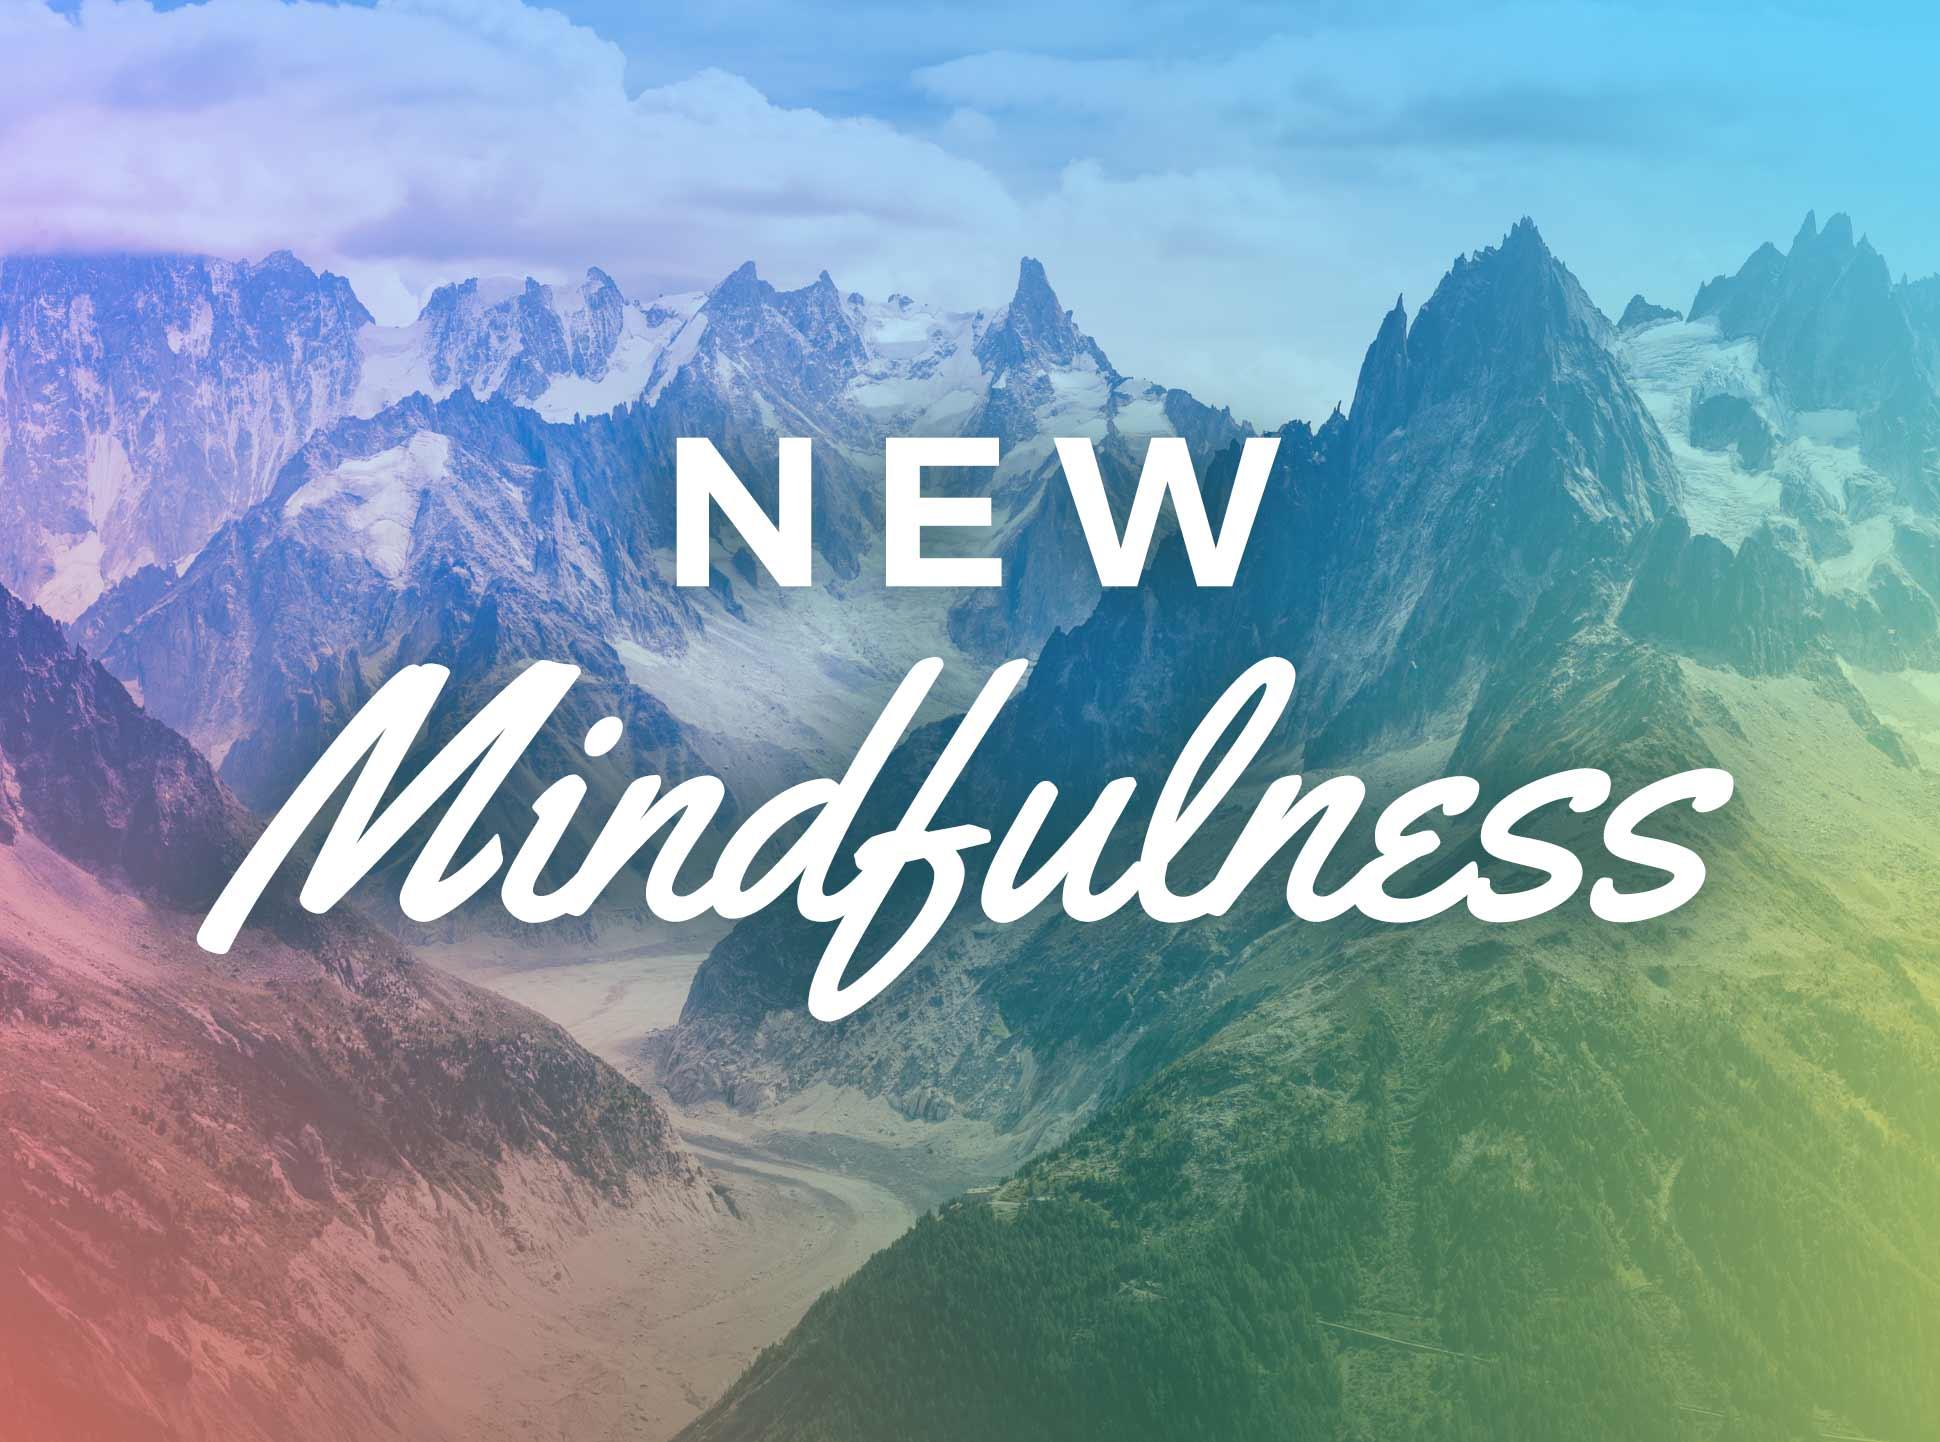 New Mindfulness